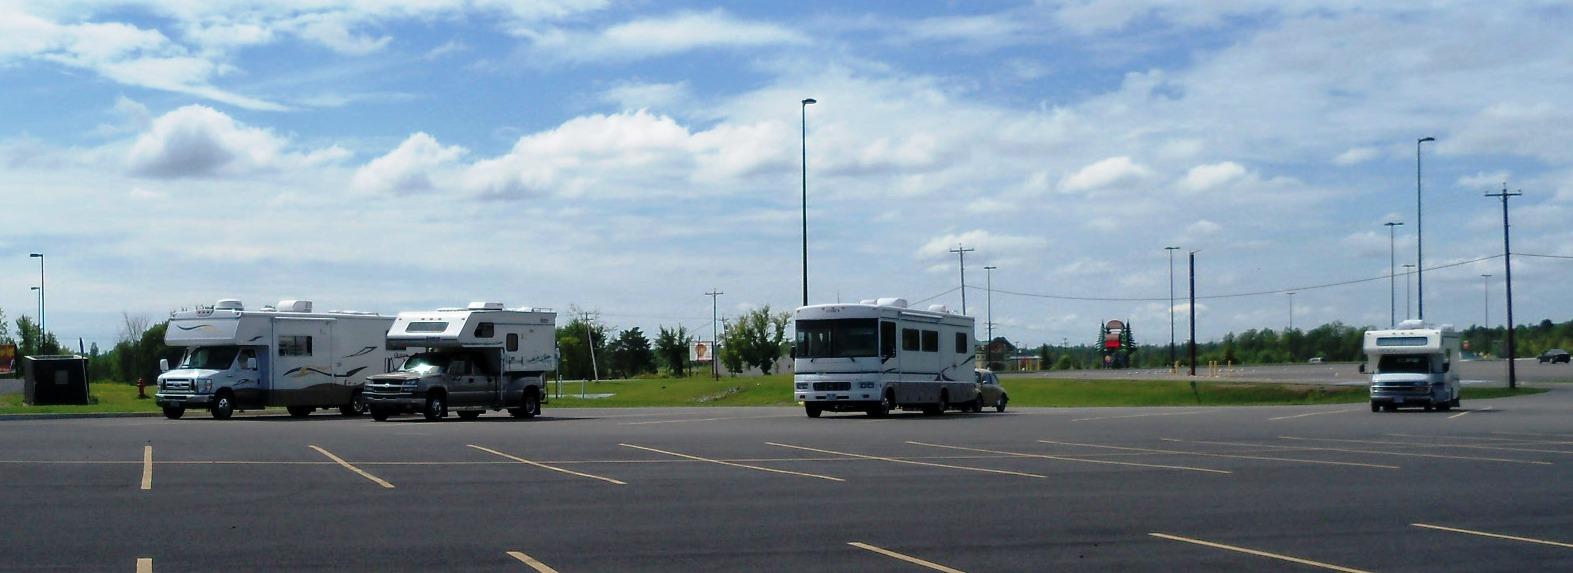 Montreal casino rv parking